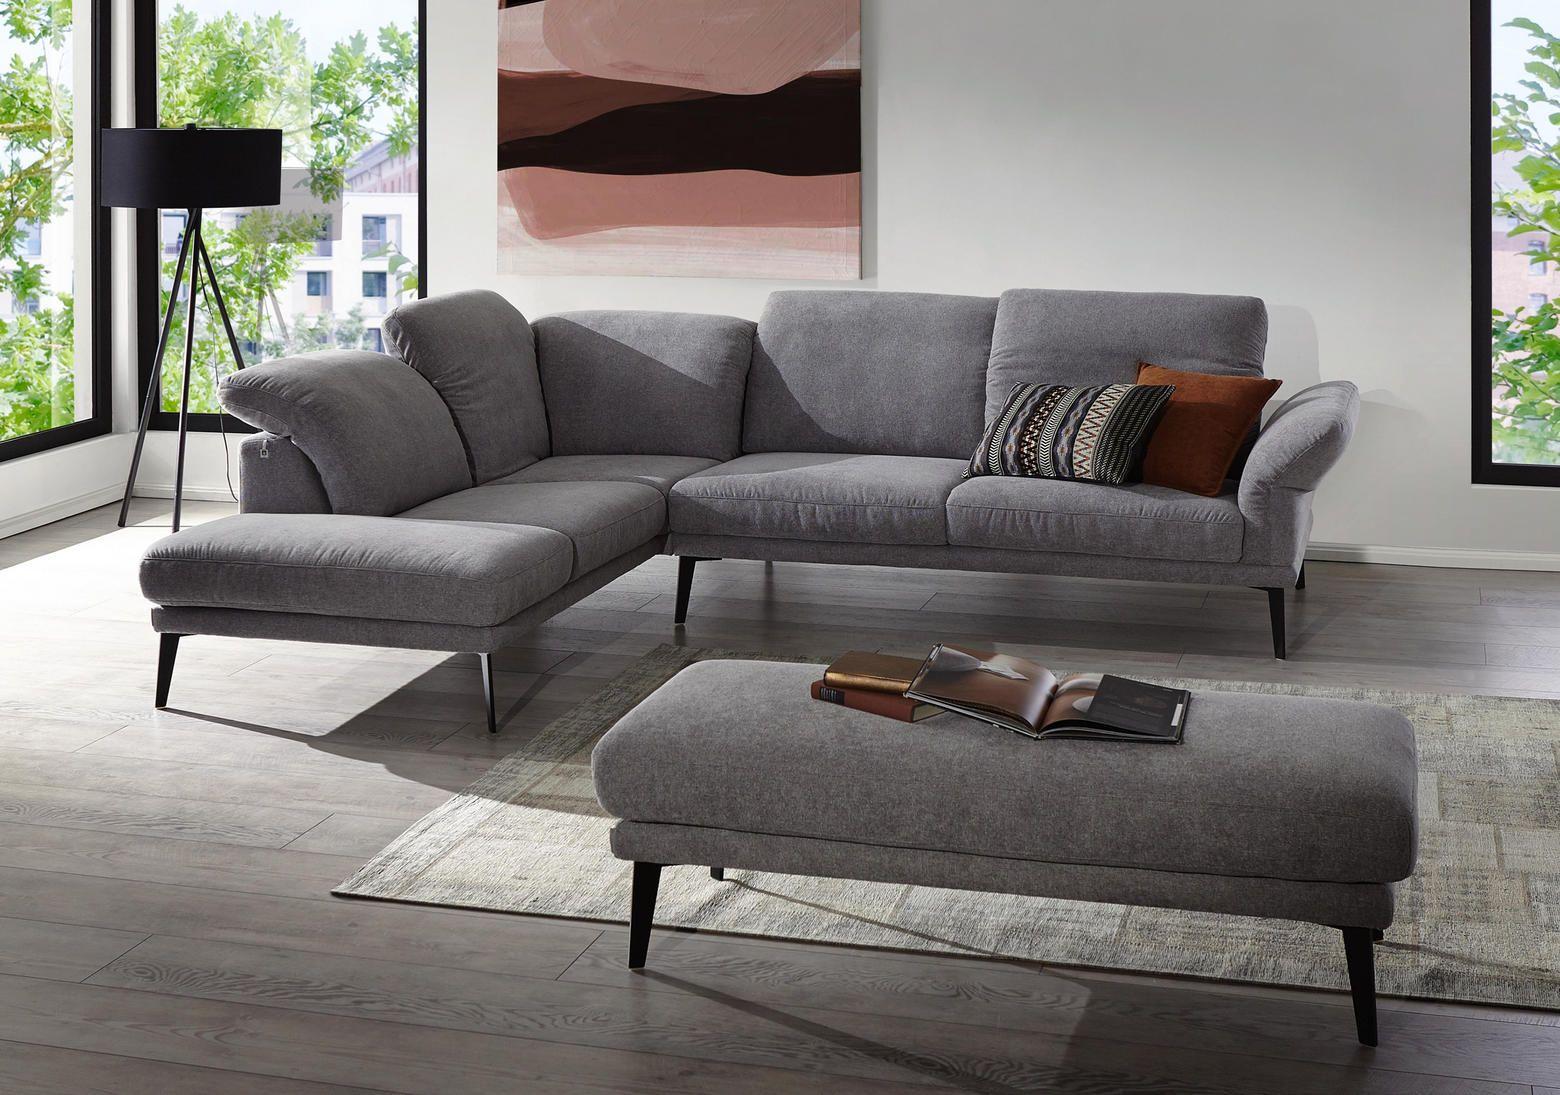 Moderne Couch In Grau Mit Fussen Aus Metall Mobel Sofa Sofa